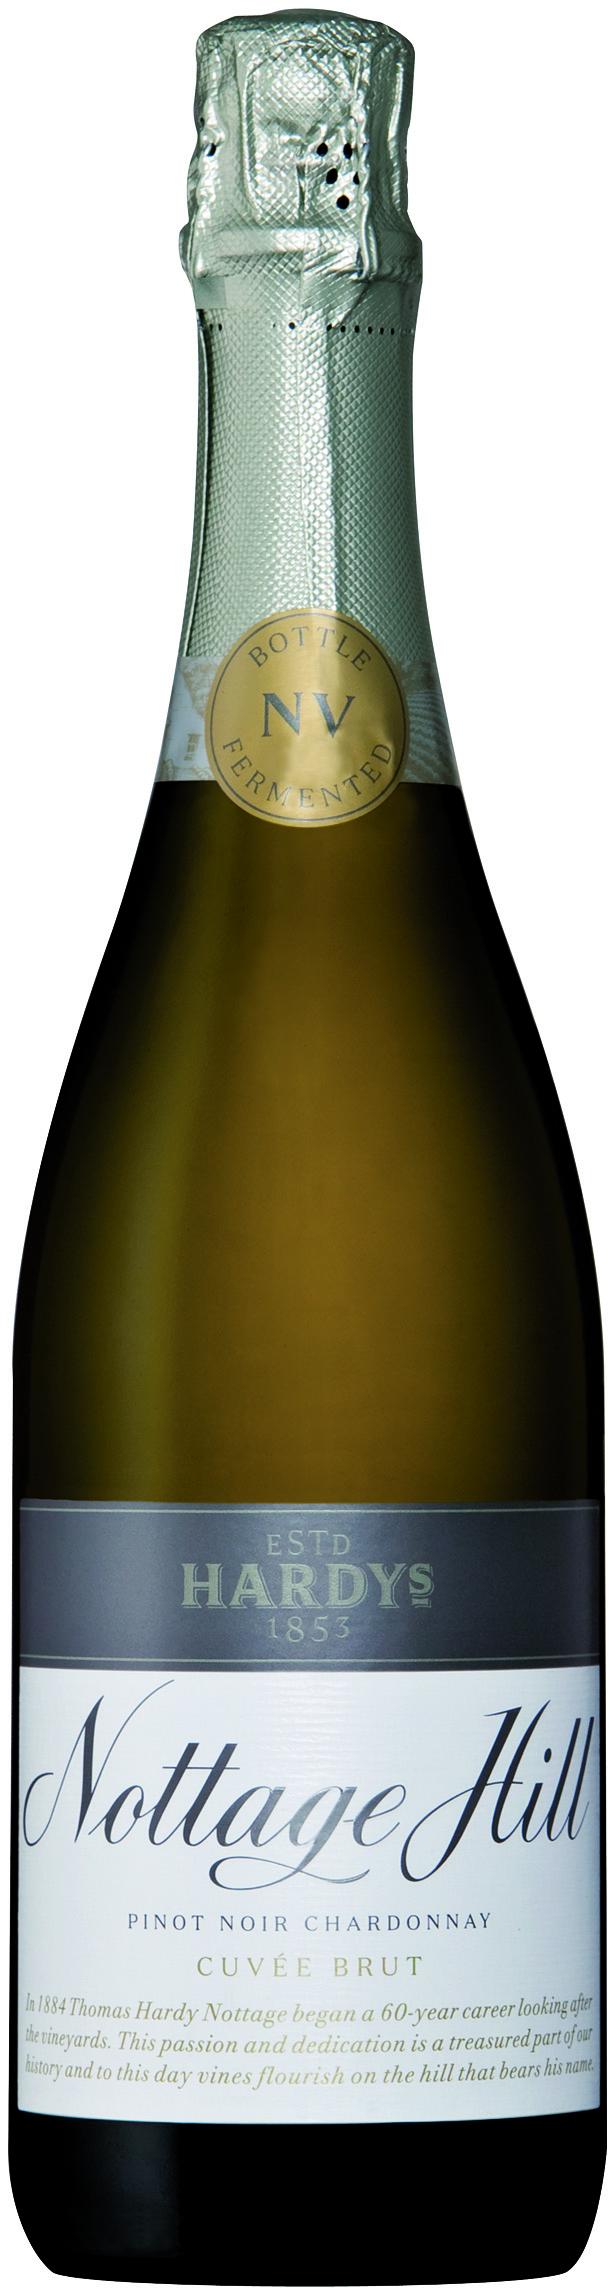 The Nottage Hill sparkling Pinot Noir Chardonnay NV